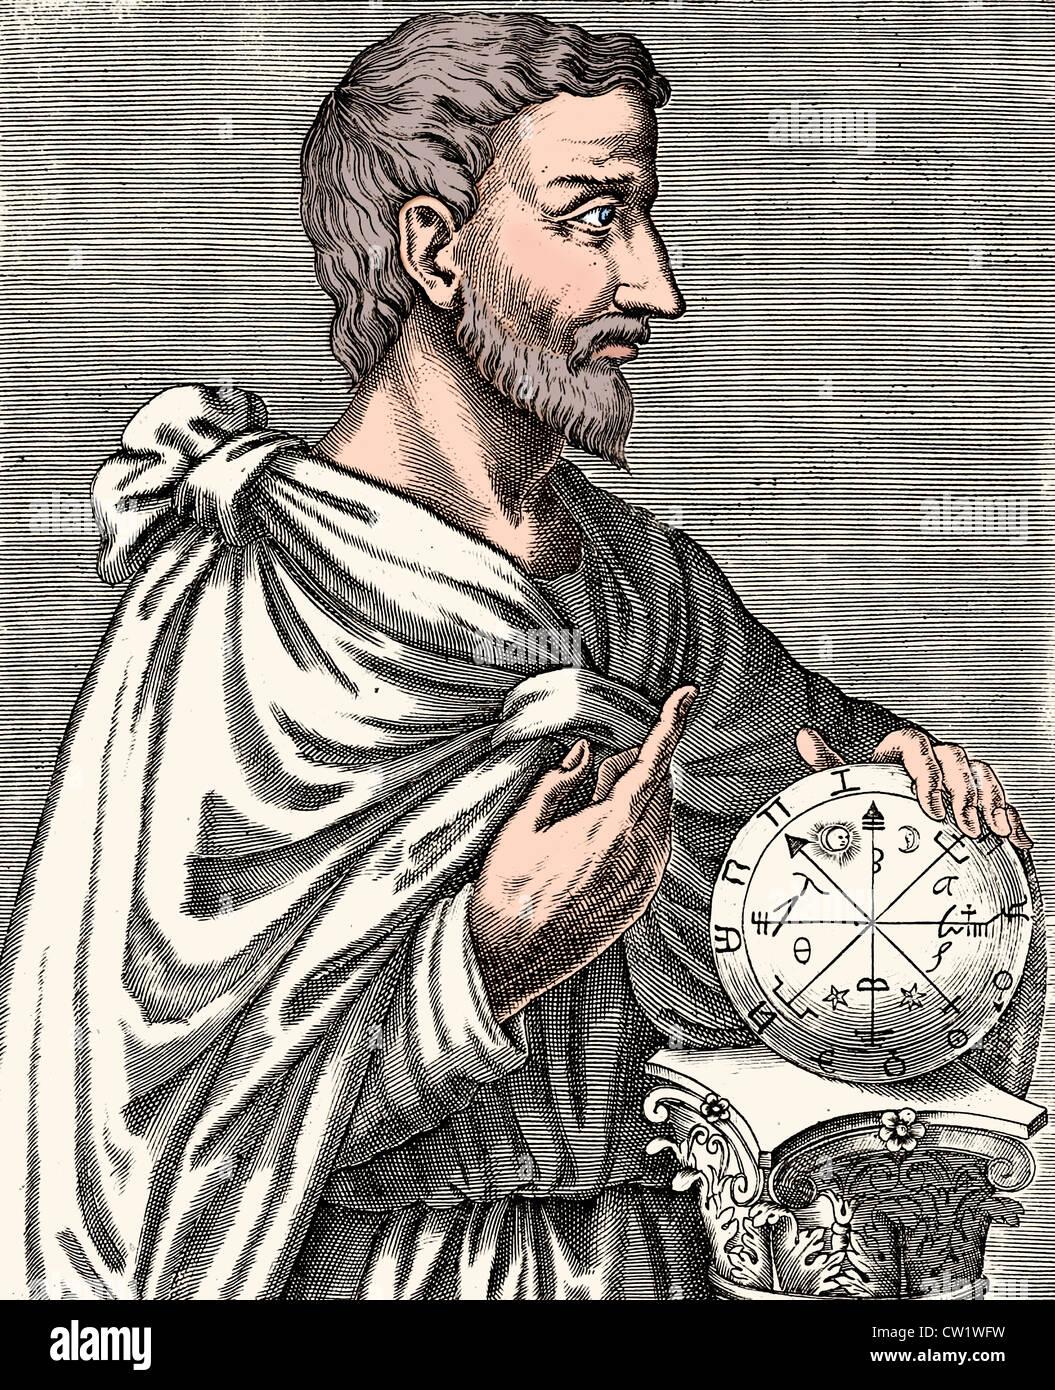 Pythagoras of Samos around 570 BC - 510 BC according to Metaponto in the Basilicata - Stock Image